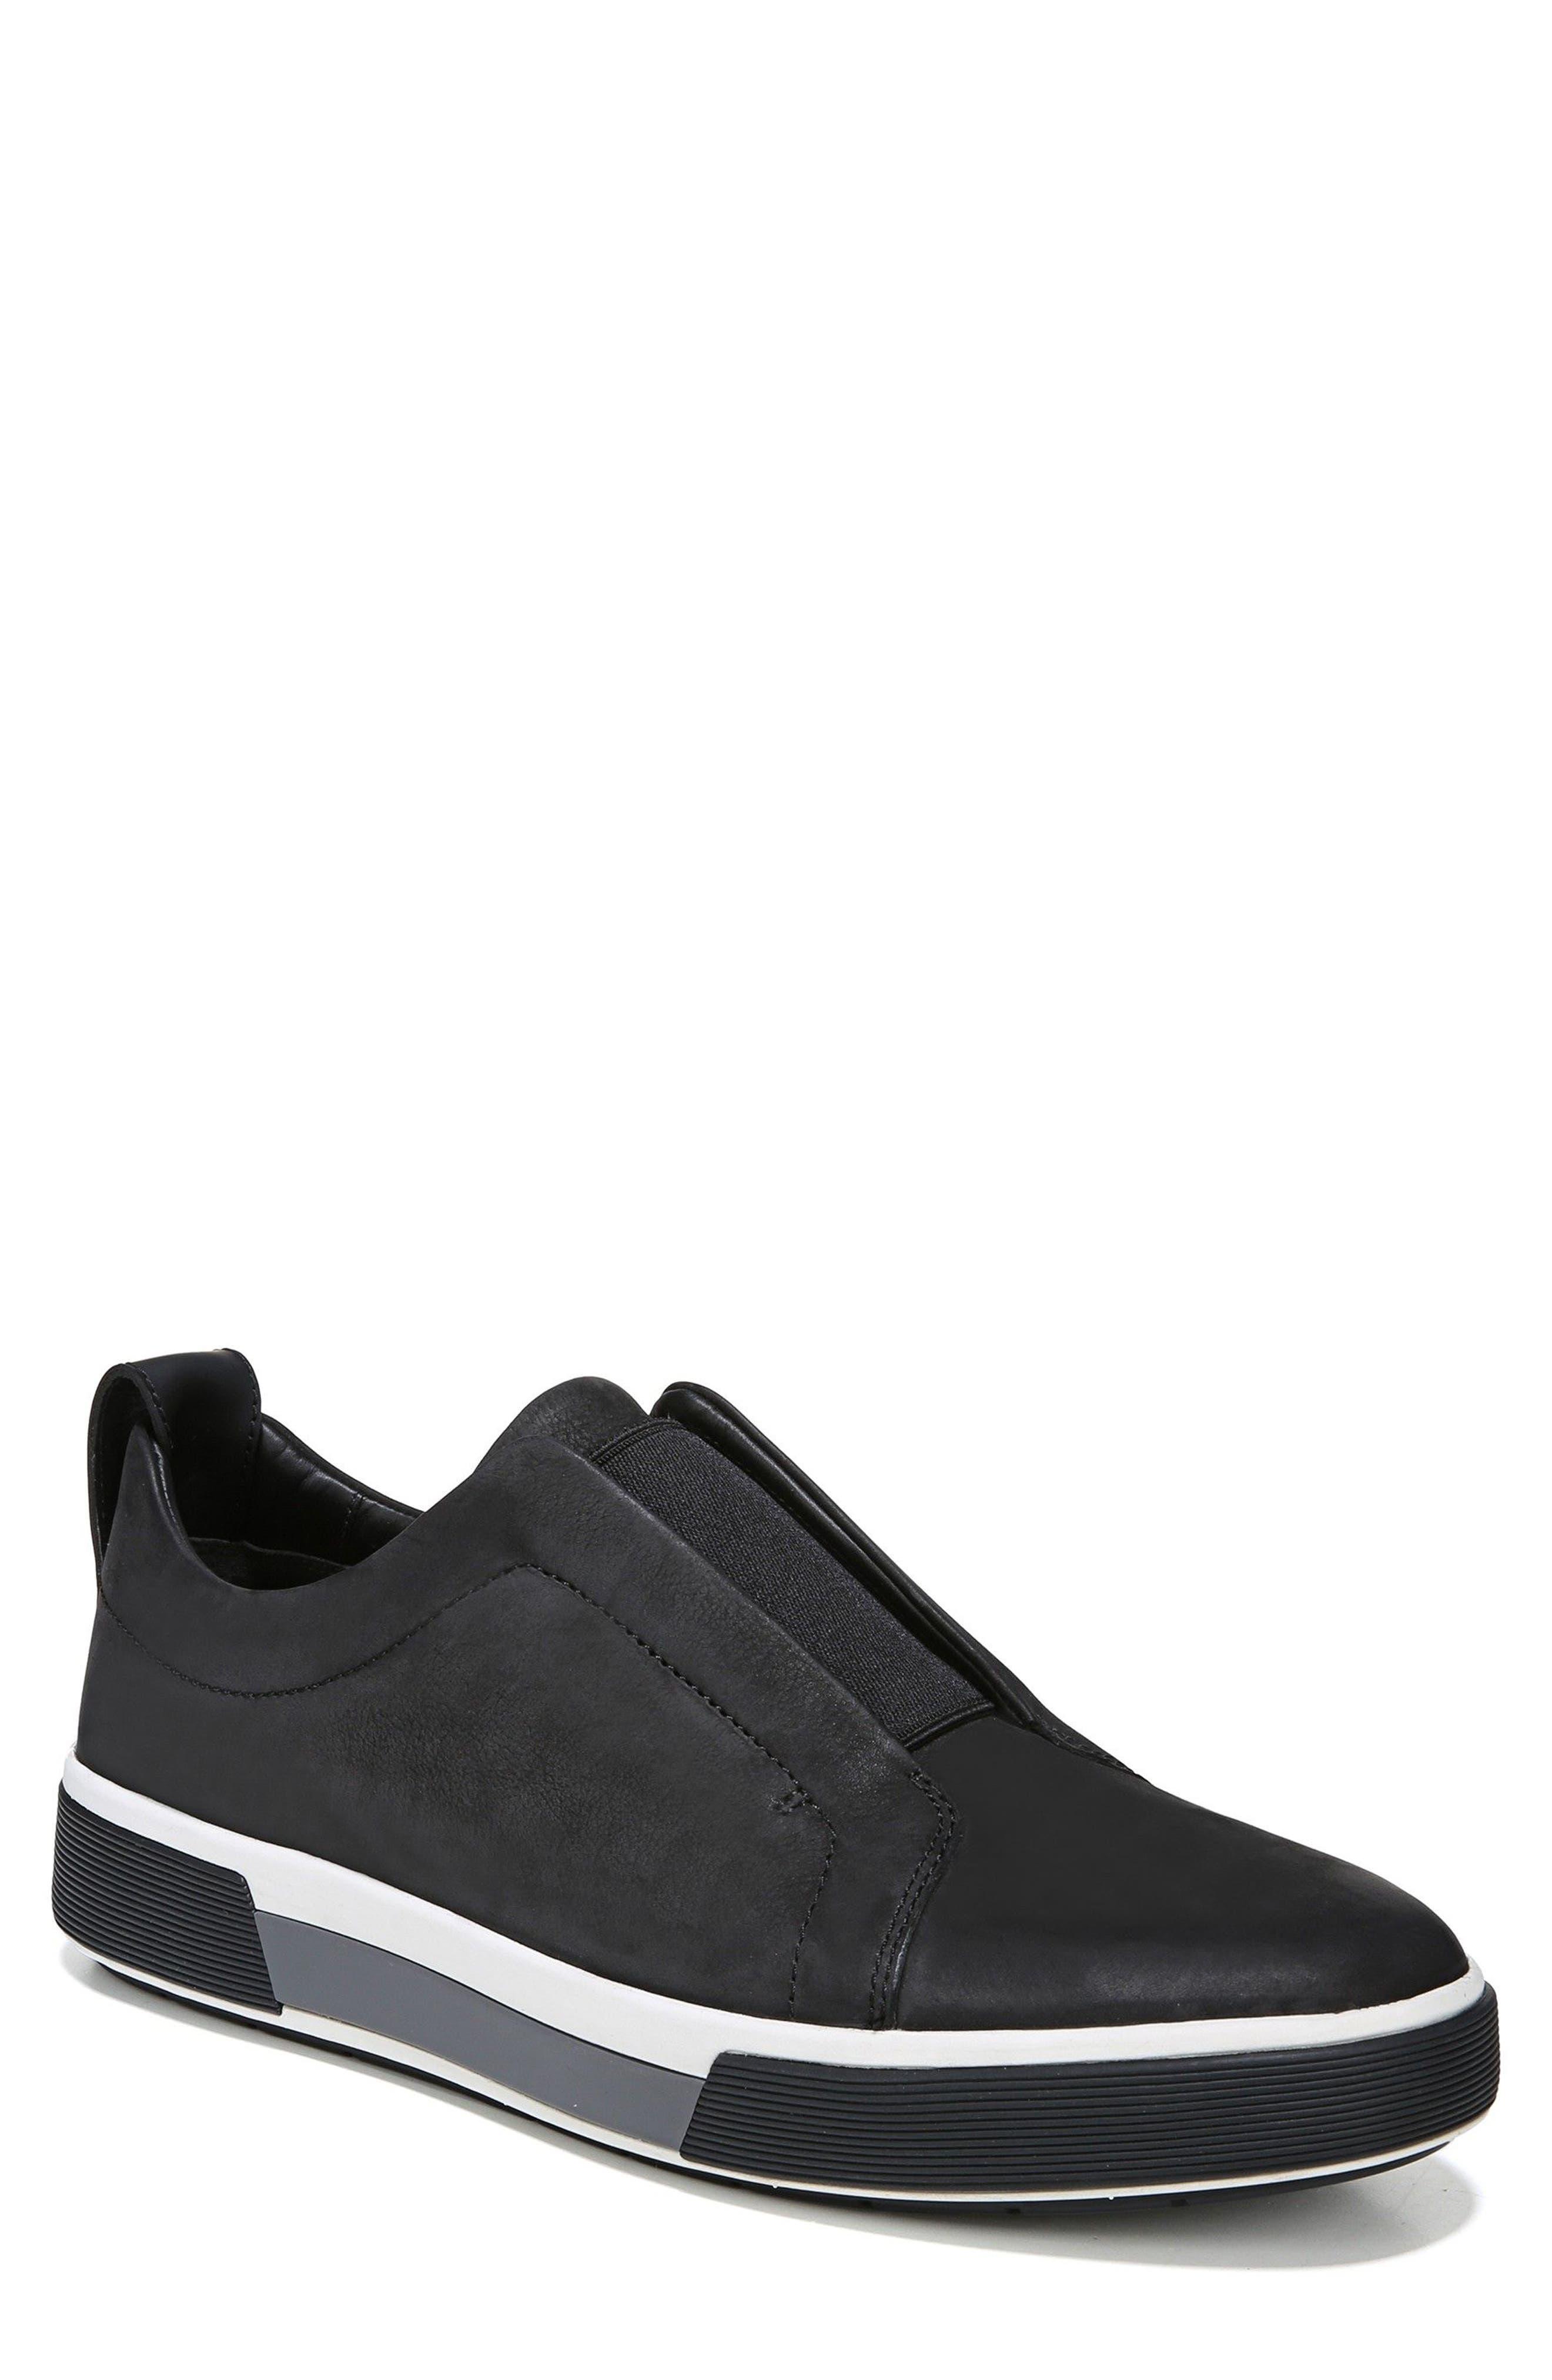 VINCE Ranger Laceless Sneaker, Main, color, BLACK